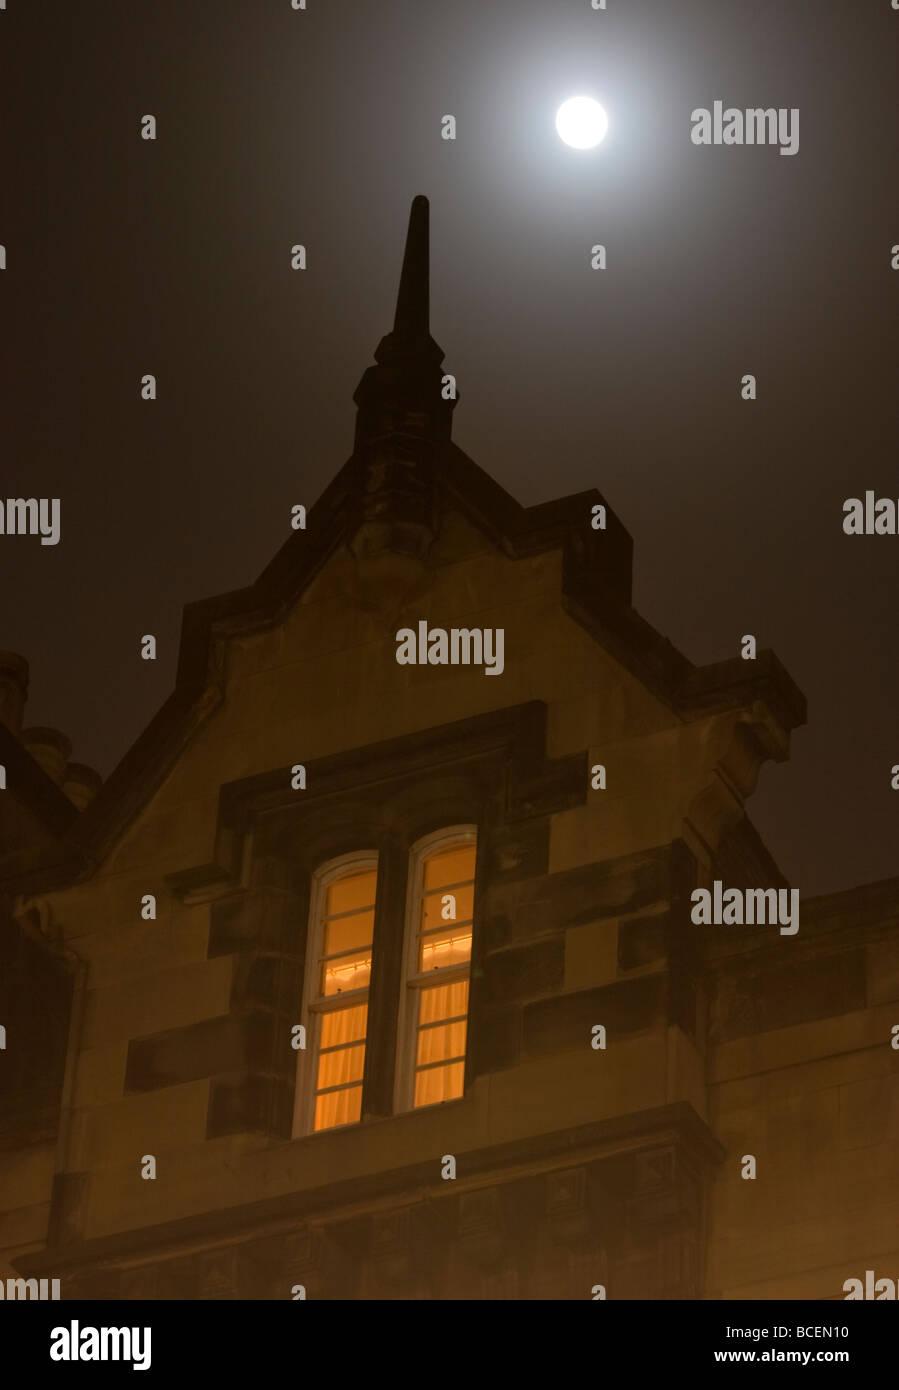 A full moon above a flat on the Royal Mile Edinburgh on a foggy night - Stock Image